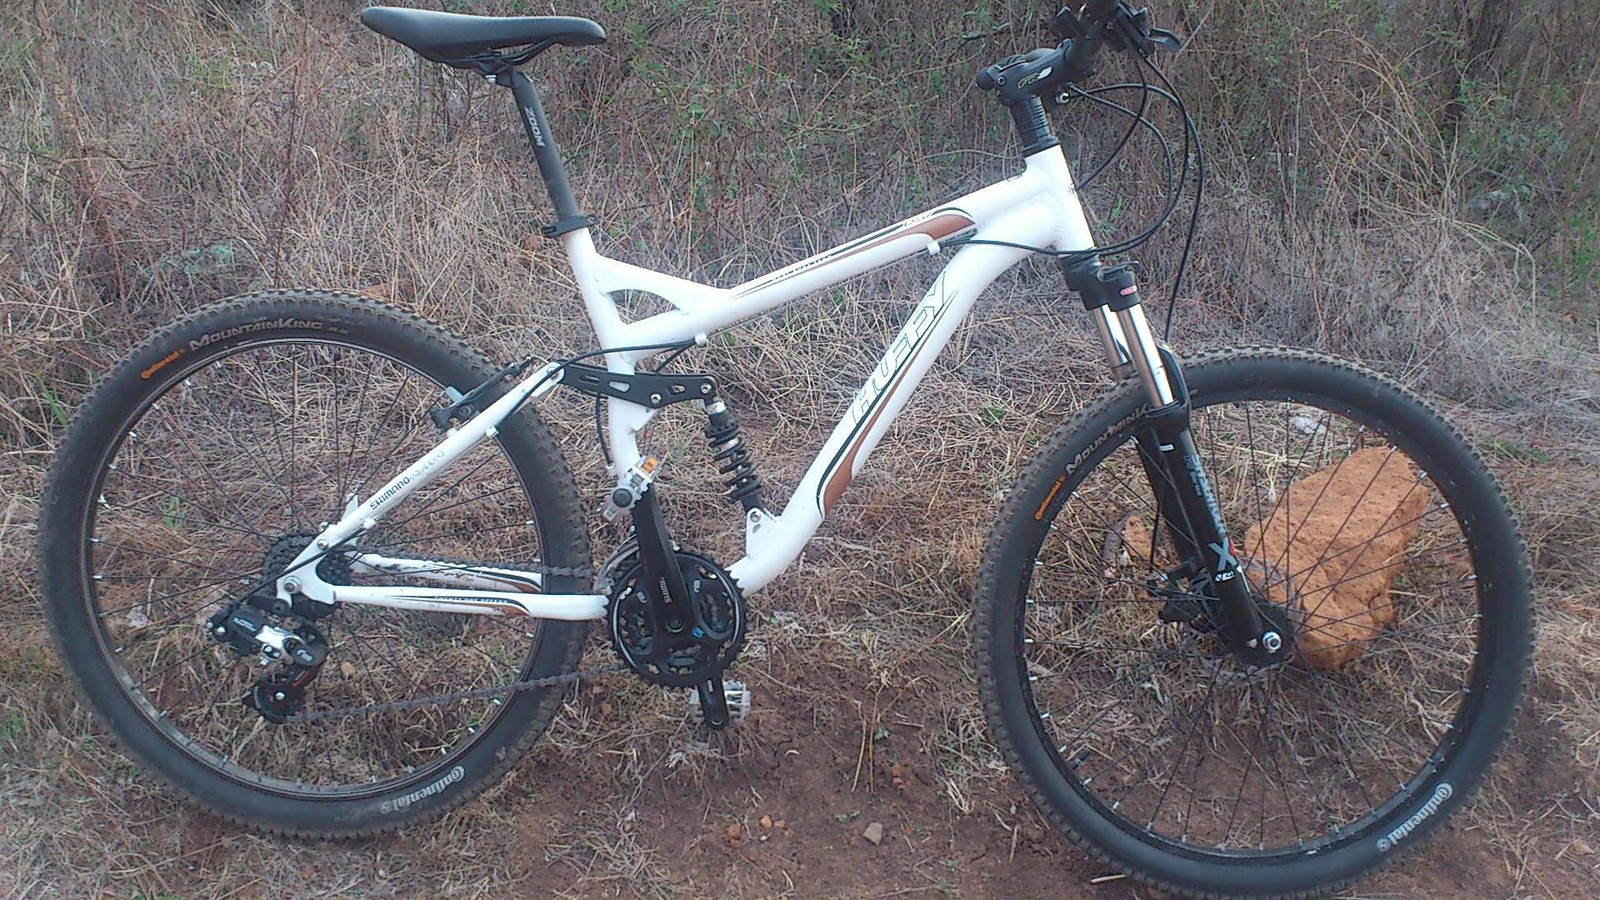 my first bike. upgrading..